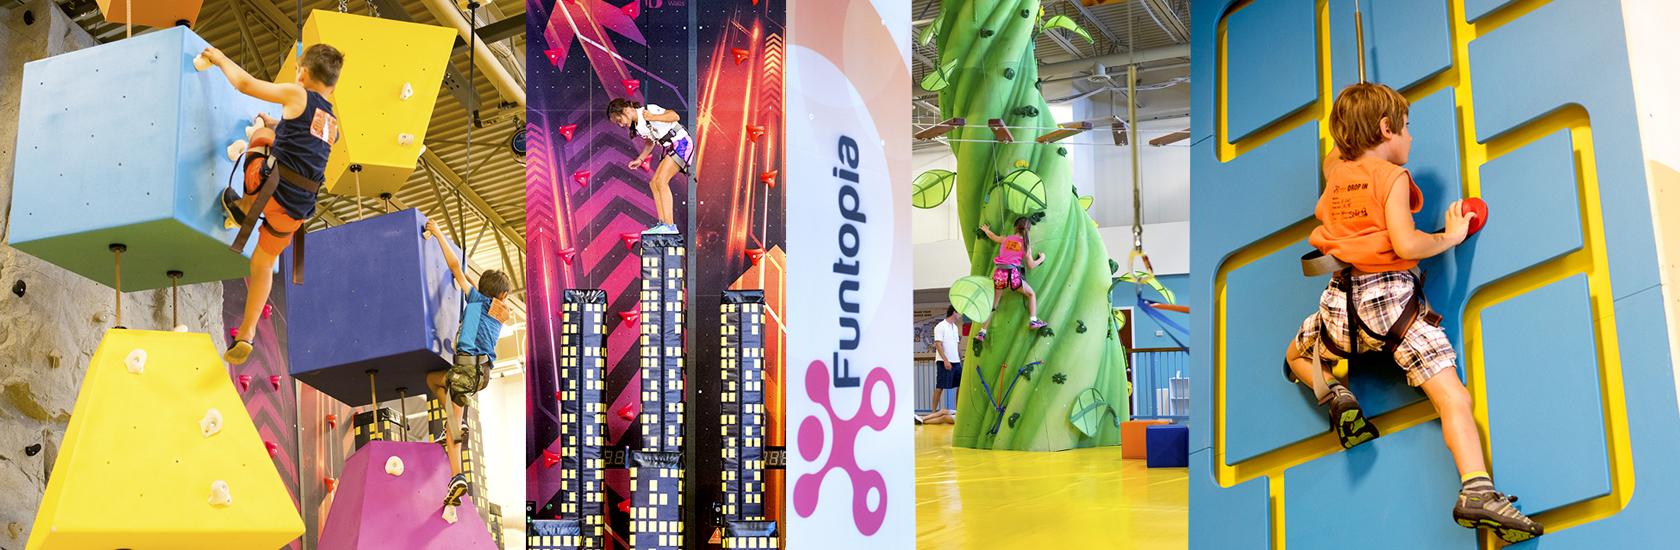 Funtopia_Glenview_Challenges_Fun-Walls